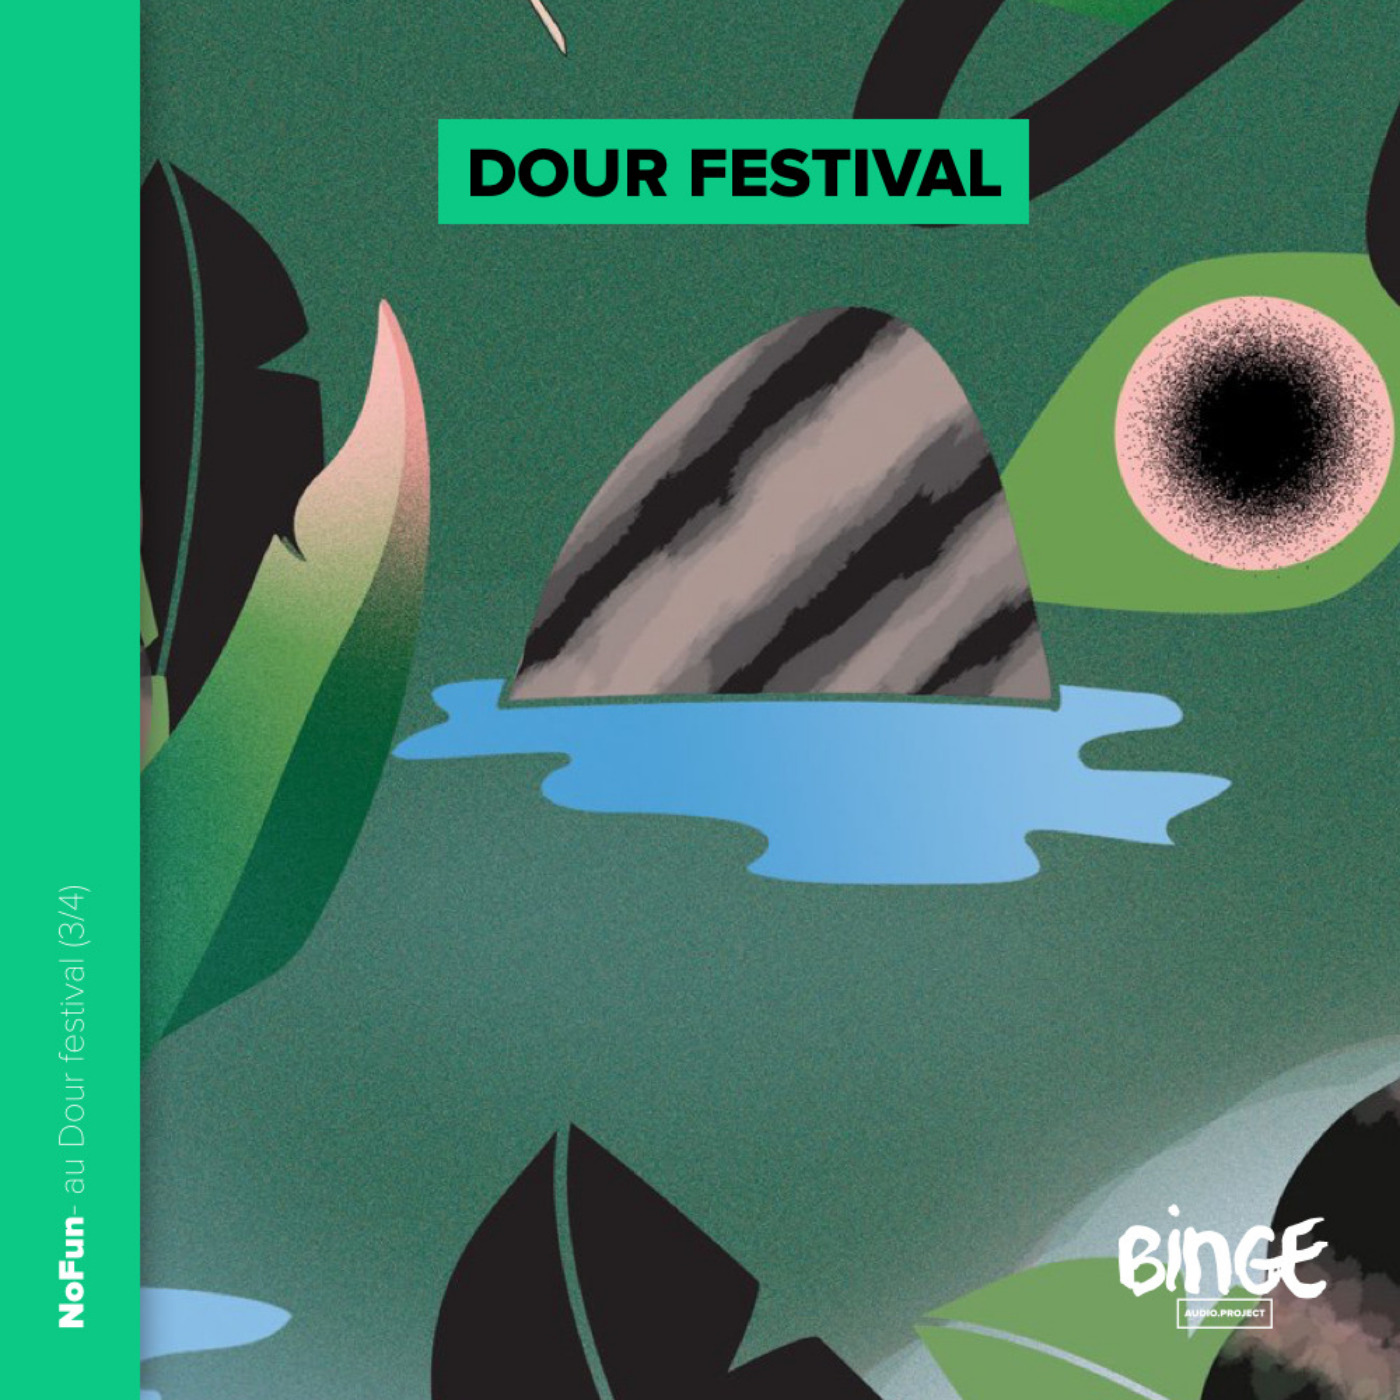 NoFun au Dour festival (3/4)